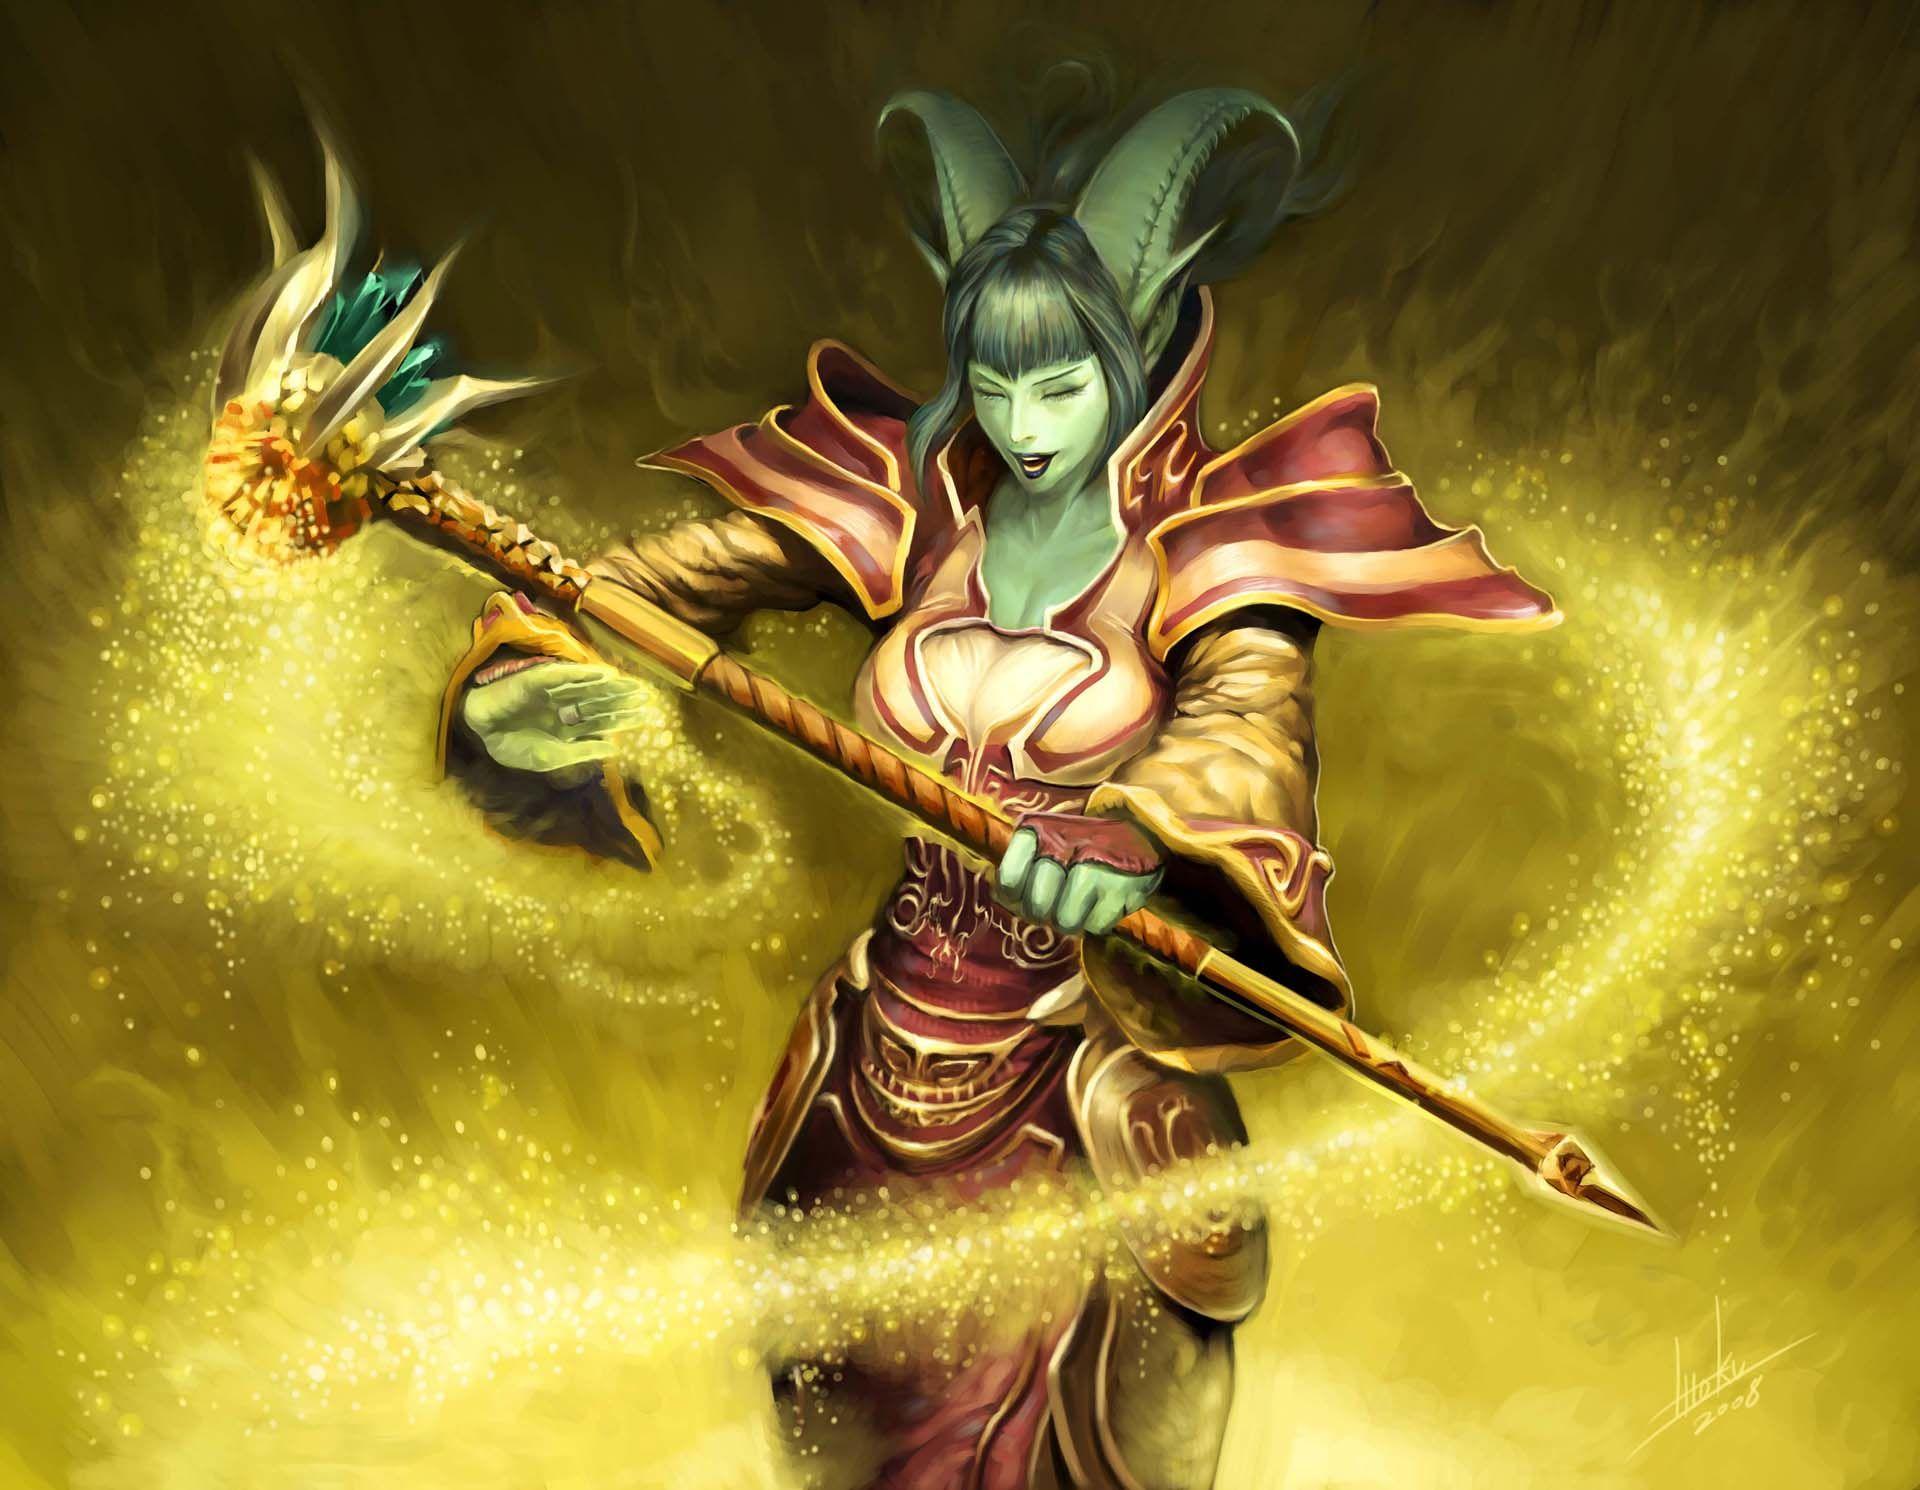 Roller skates tcg - Ninoo Of The Light World Of Warcraft Trading Card Game Drums Of War